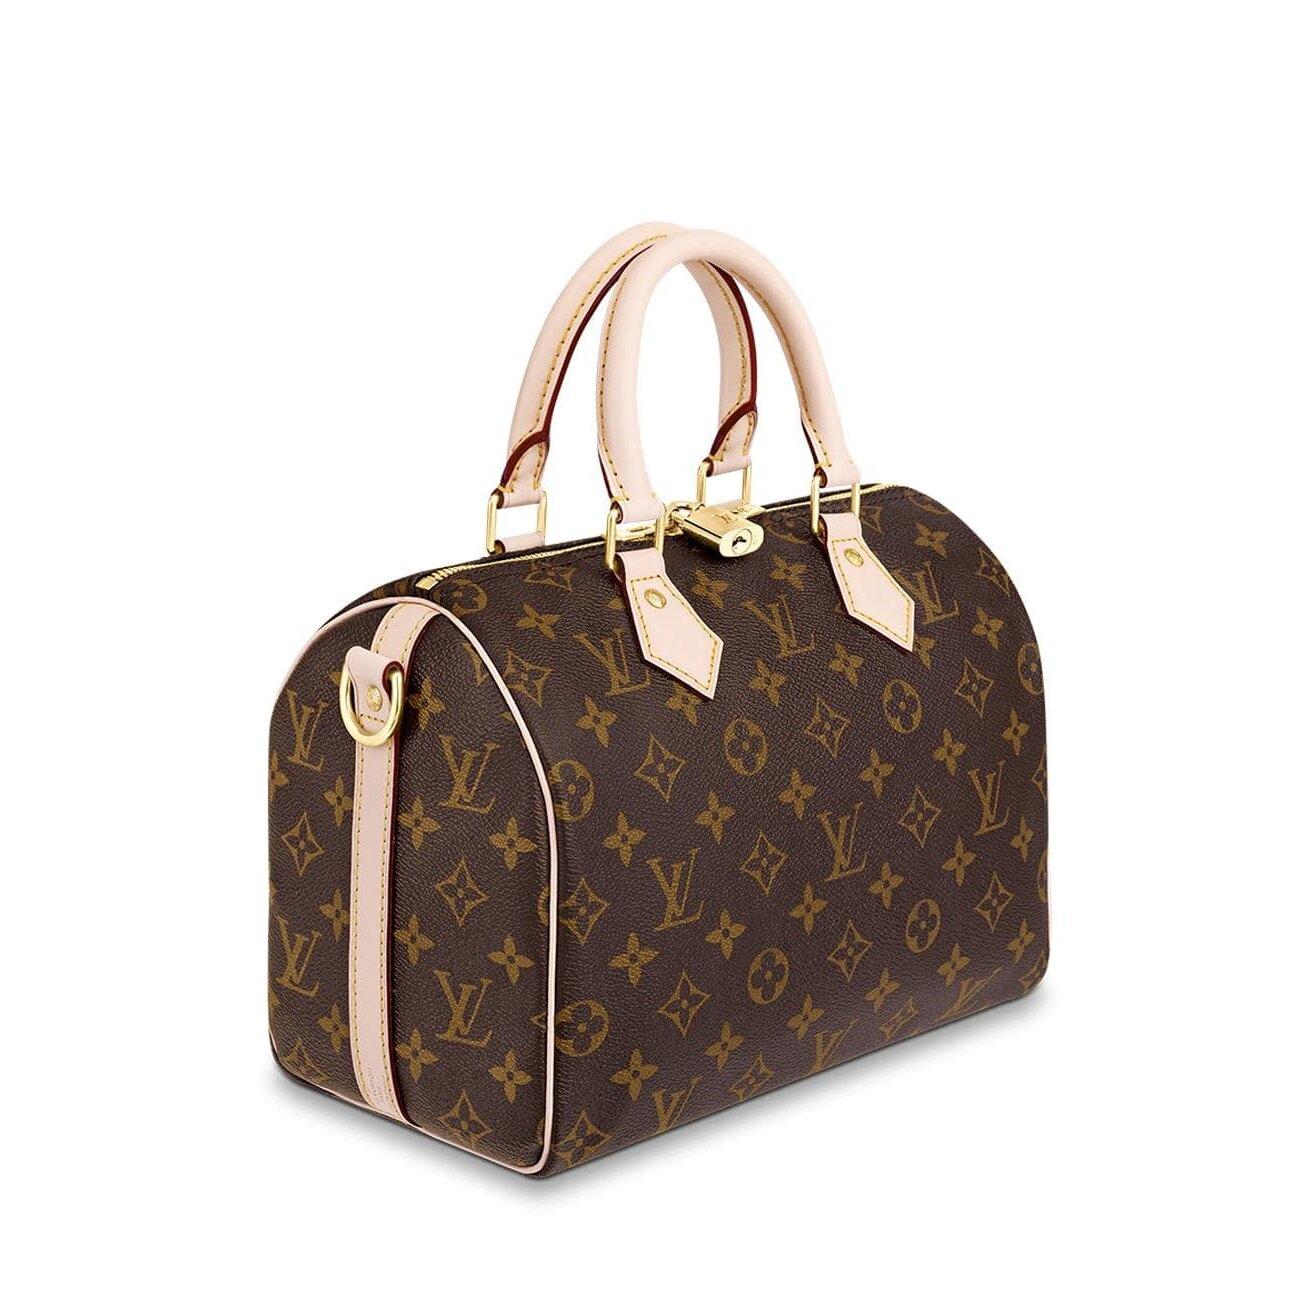 【Chiu189英歐代購】Louis Vuitton SPEEDY BANDOULIRE 25 M41113